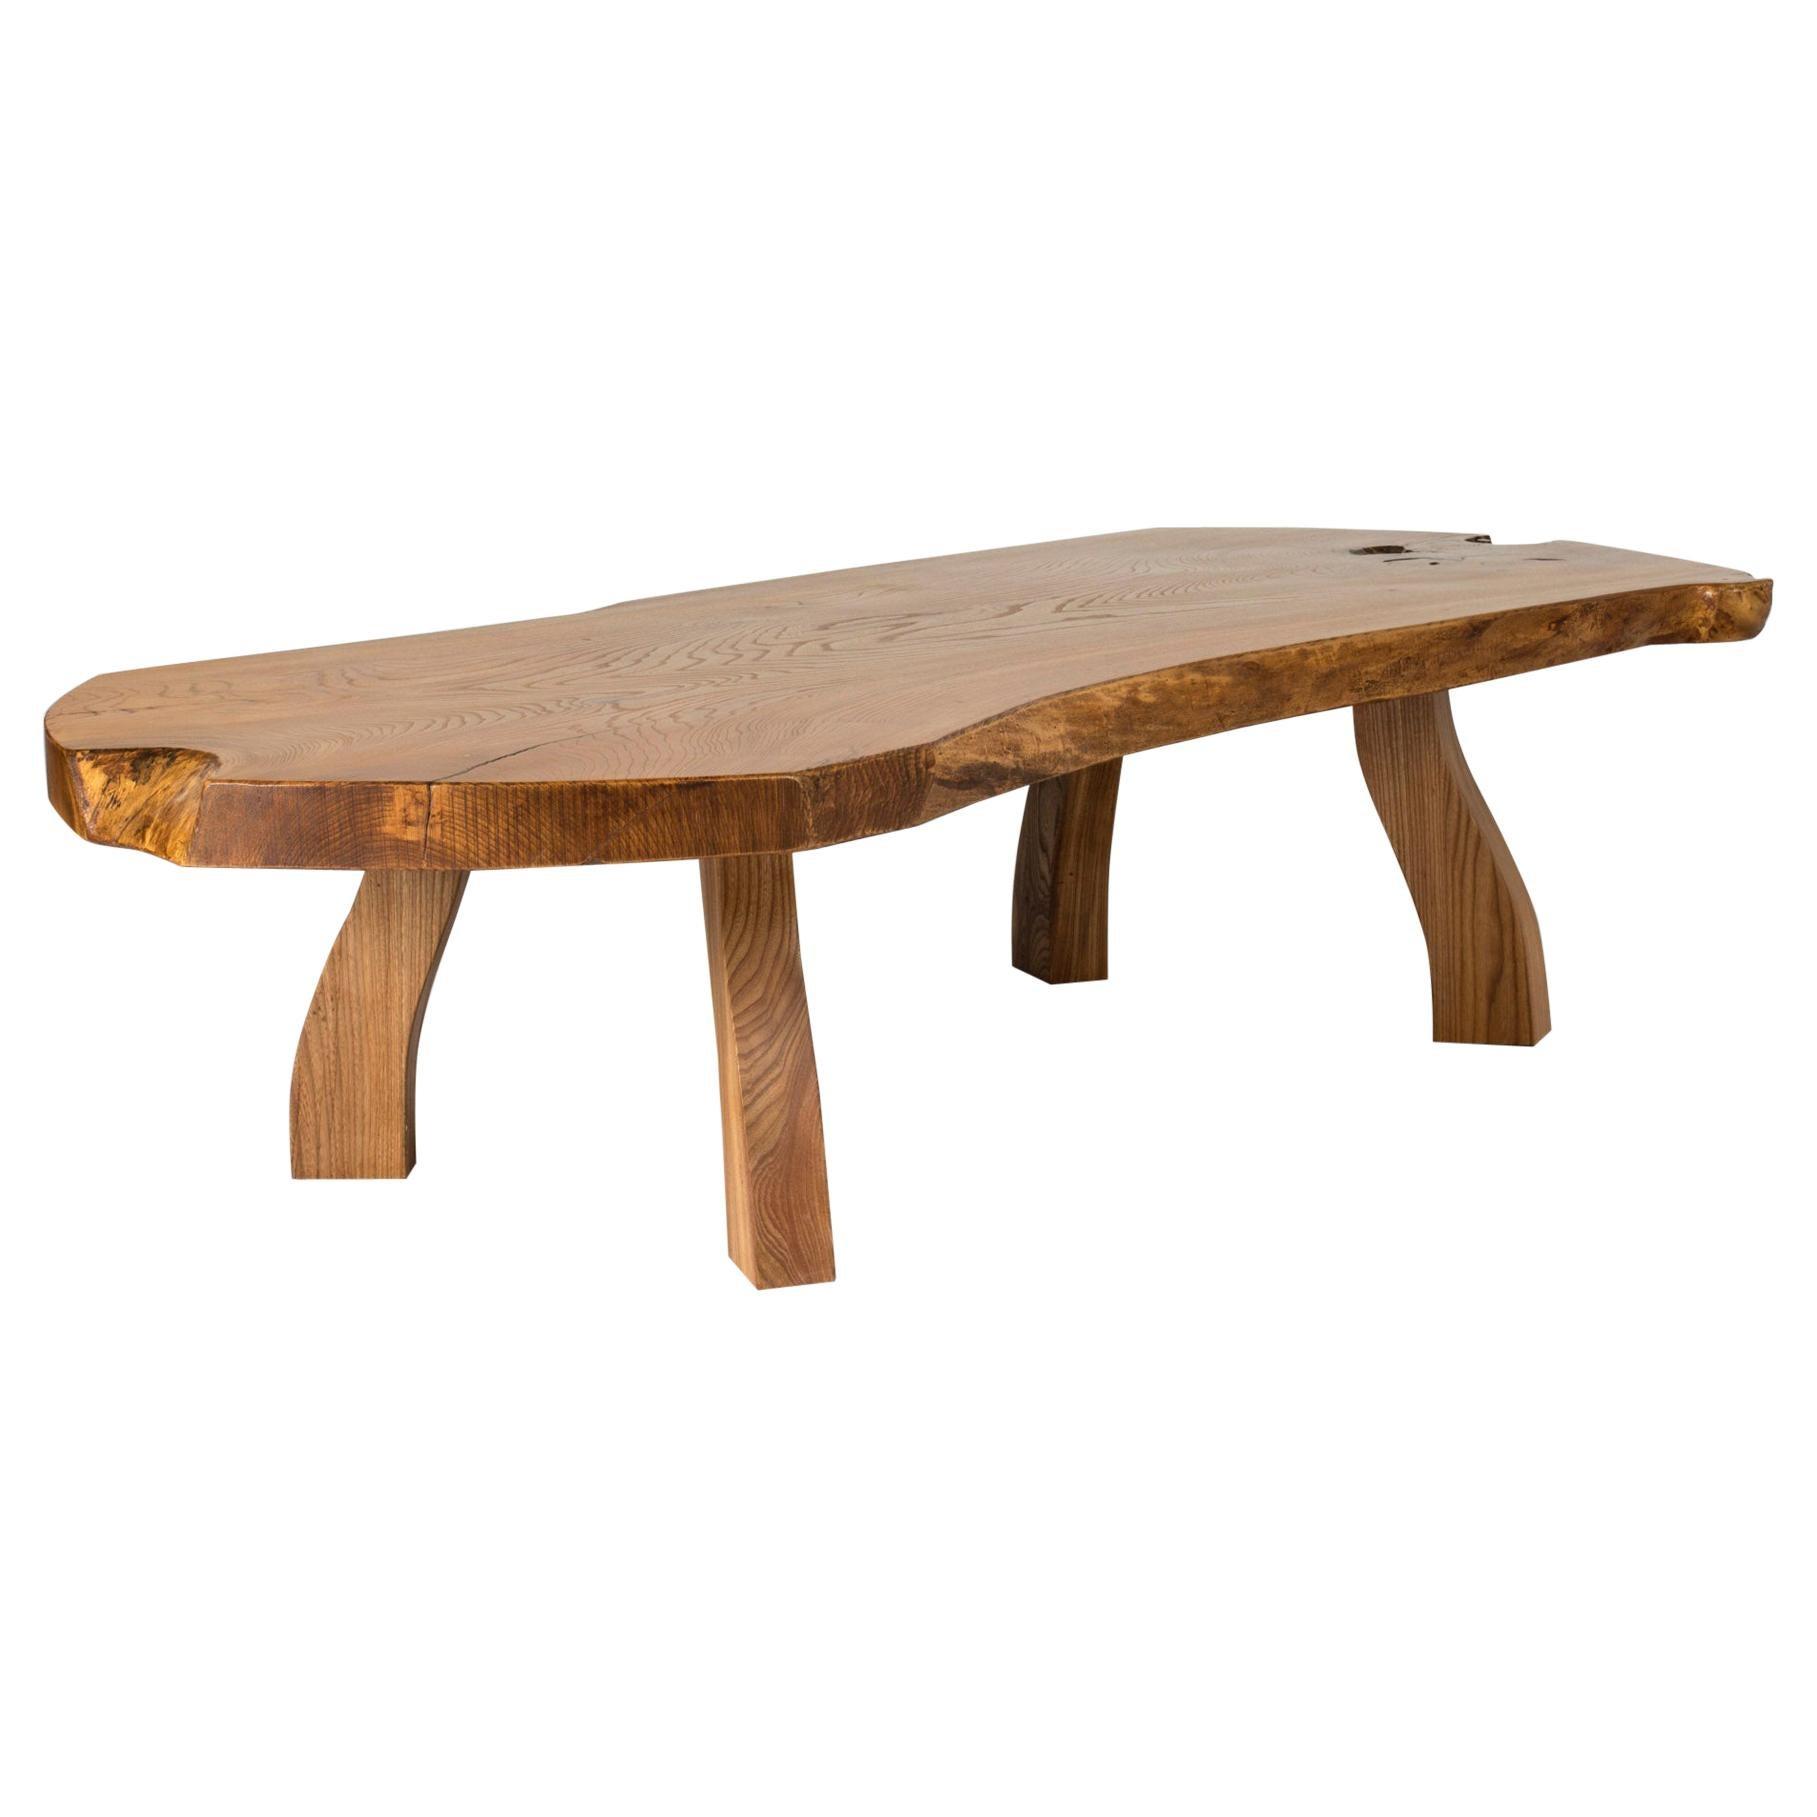 Pine Slab Coffee Table from Carl-Axel Beijbom